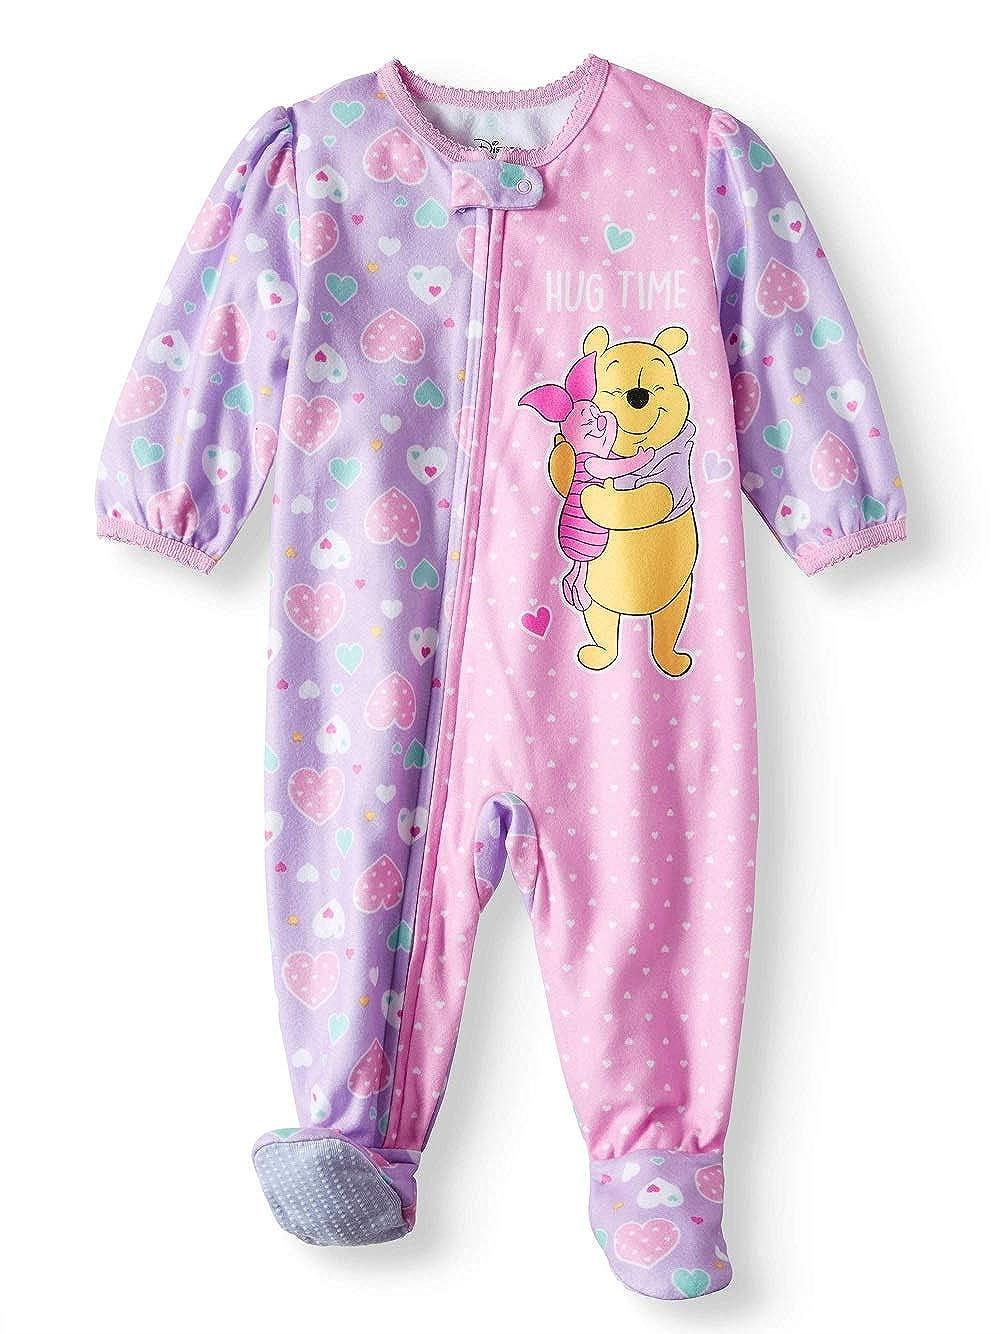 ELCW37K Kids /& Toddler Pants Soft Cozy Baby Sweatpants France Flag-1 Fleece Pants Training Pants